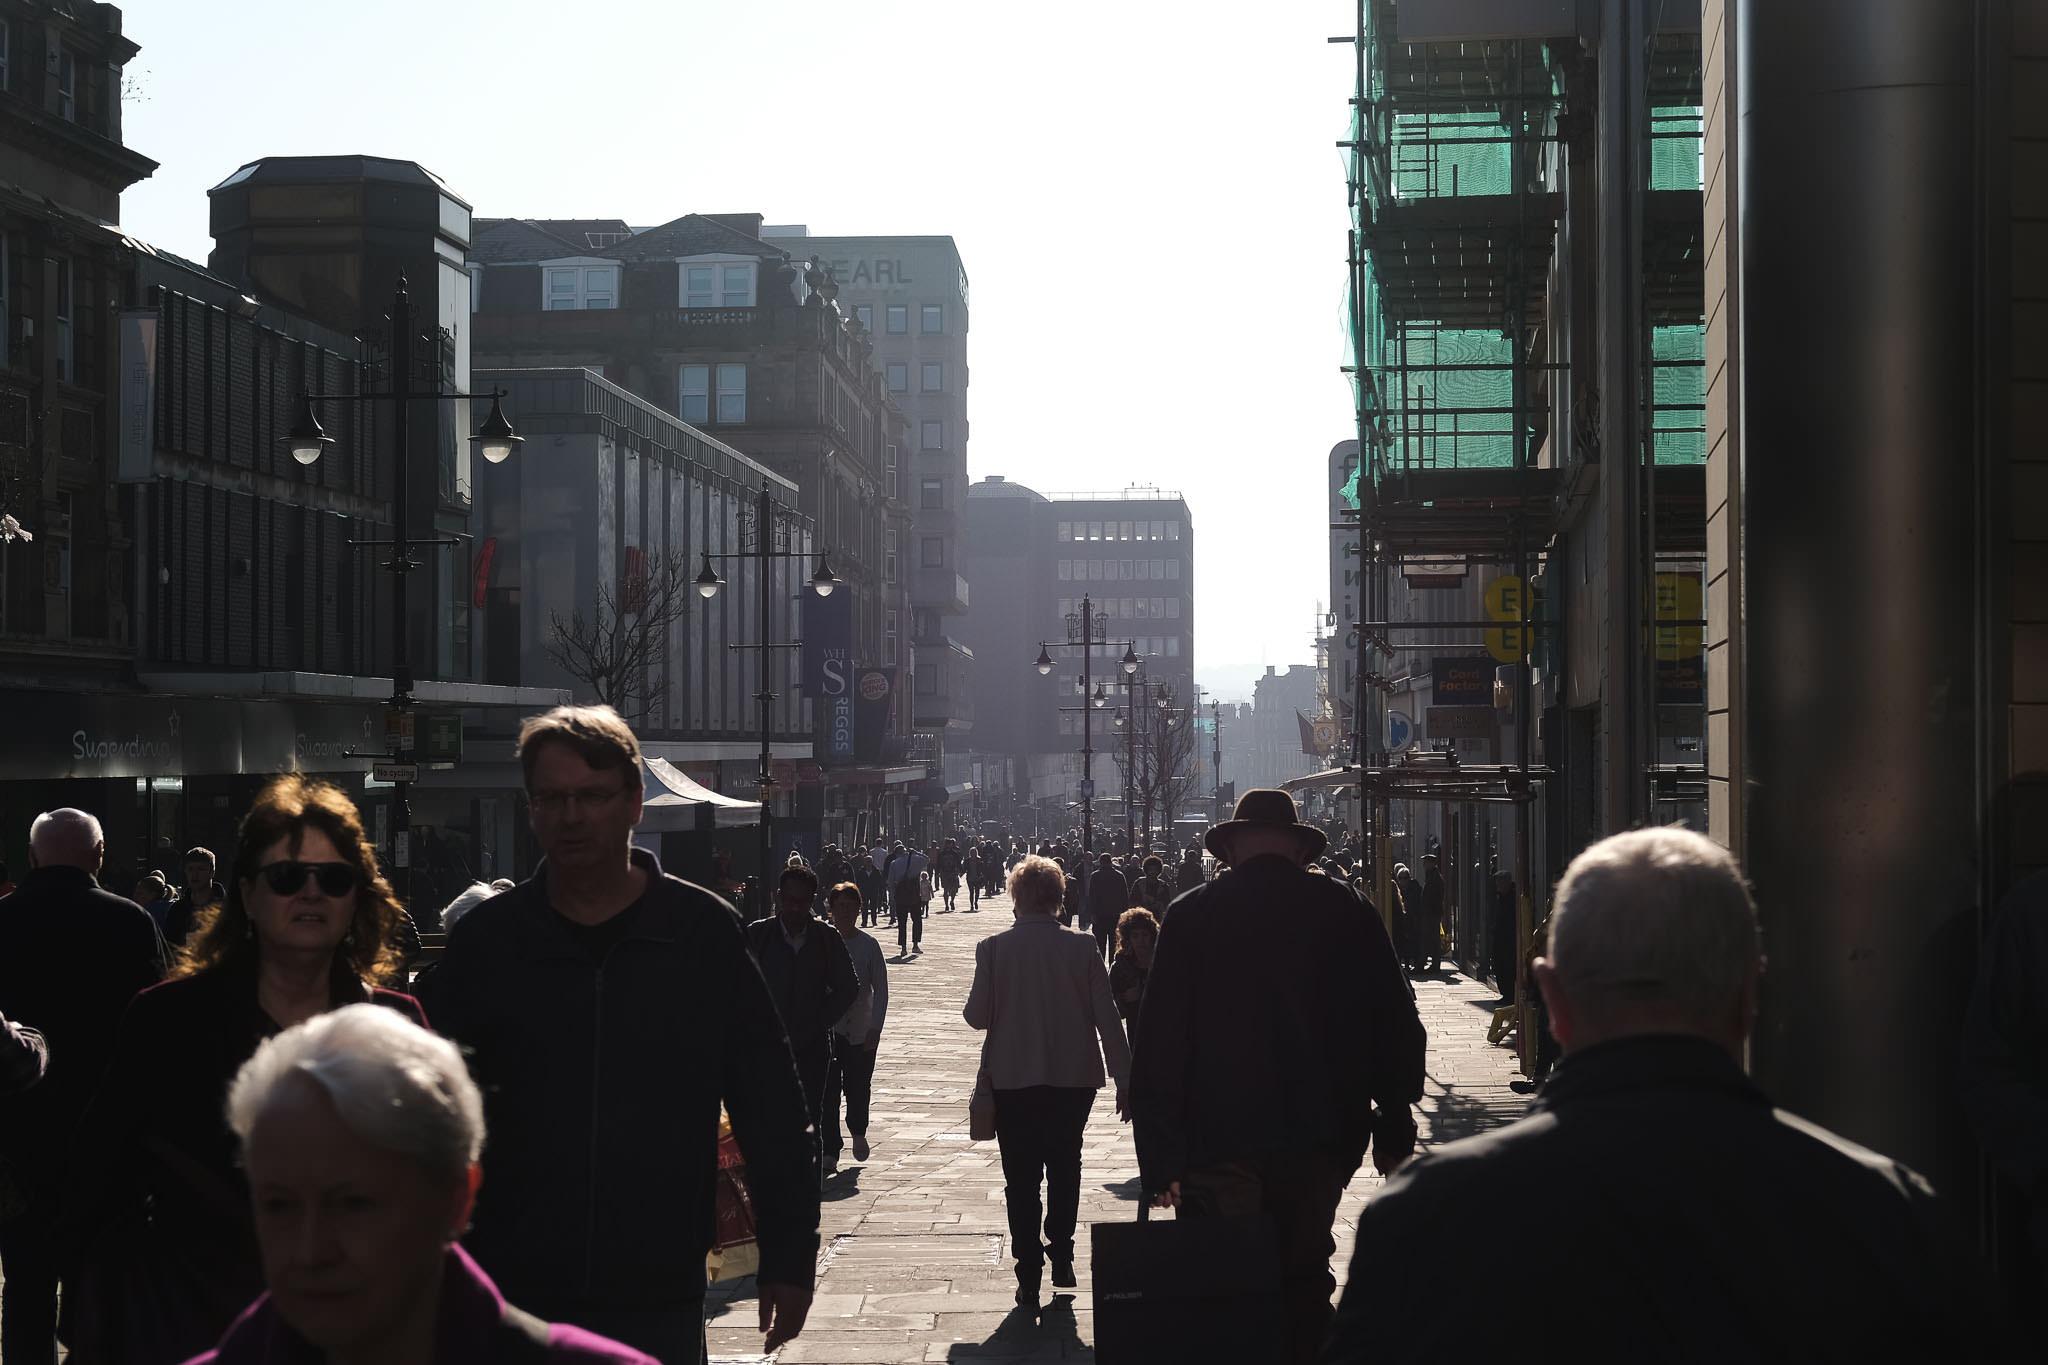 A man in a hat walks down Northumberland Street in Newcastle in low winter sun